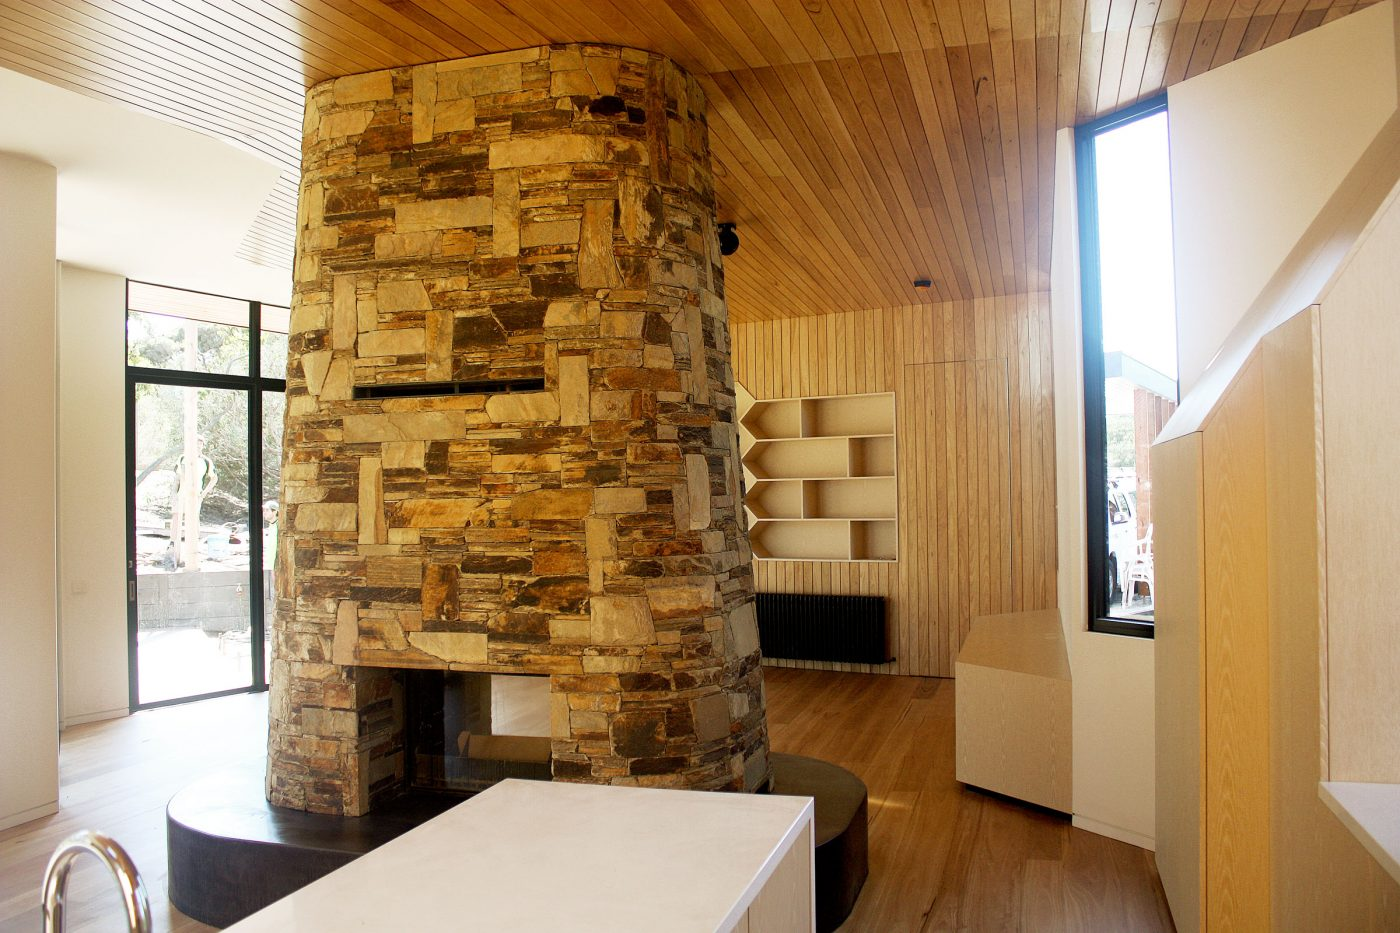 Portsea-House - Architects: BKK Architects, Builder: Layton Builders